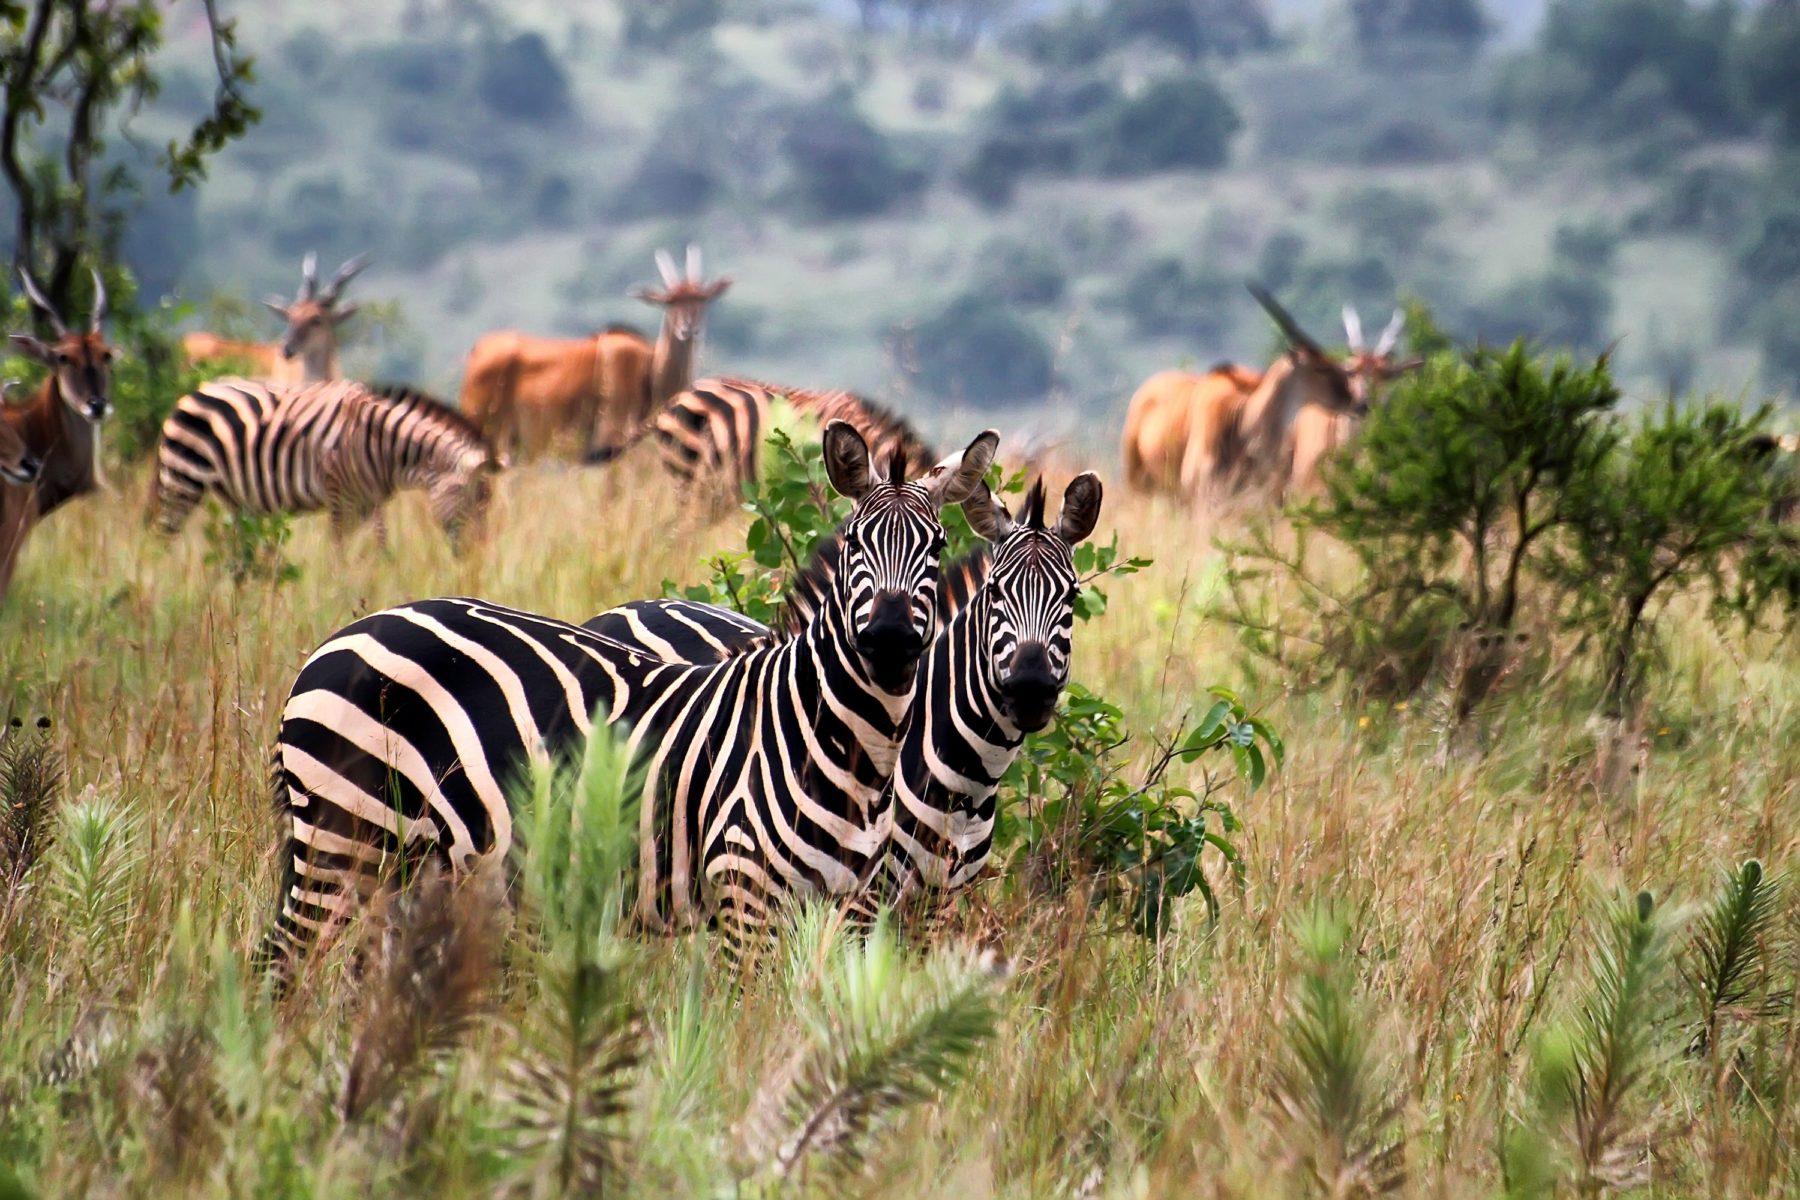 zebras in akagera national park in rwanda